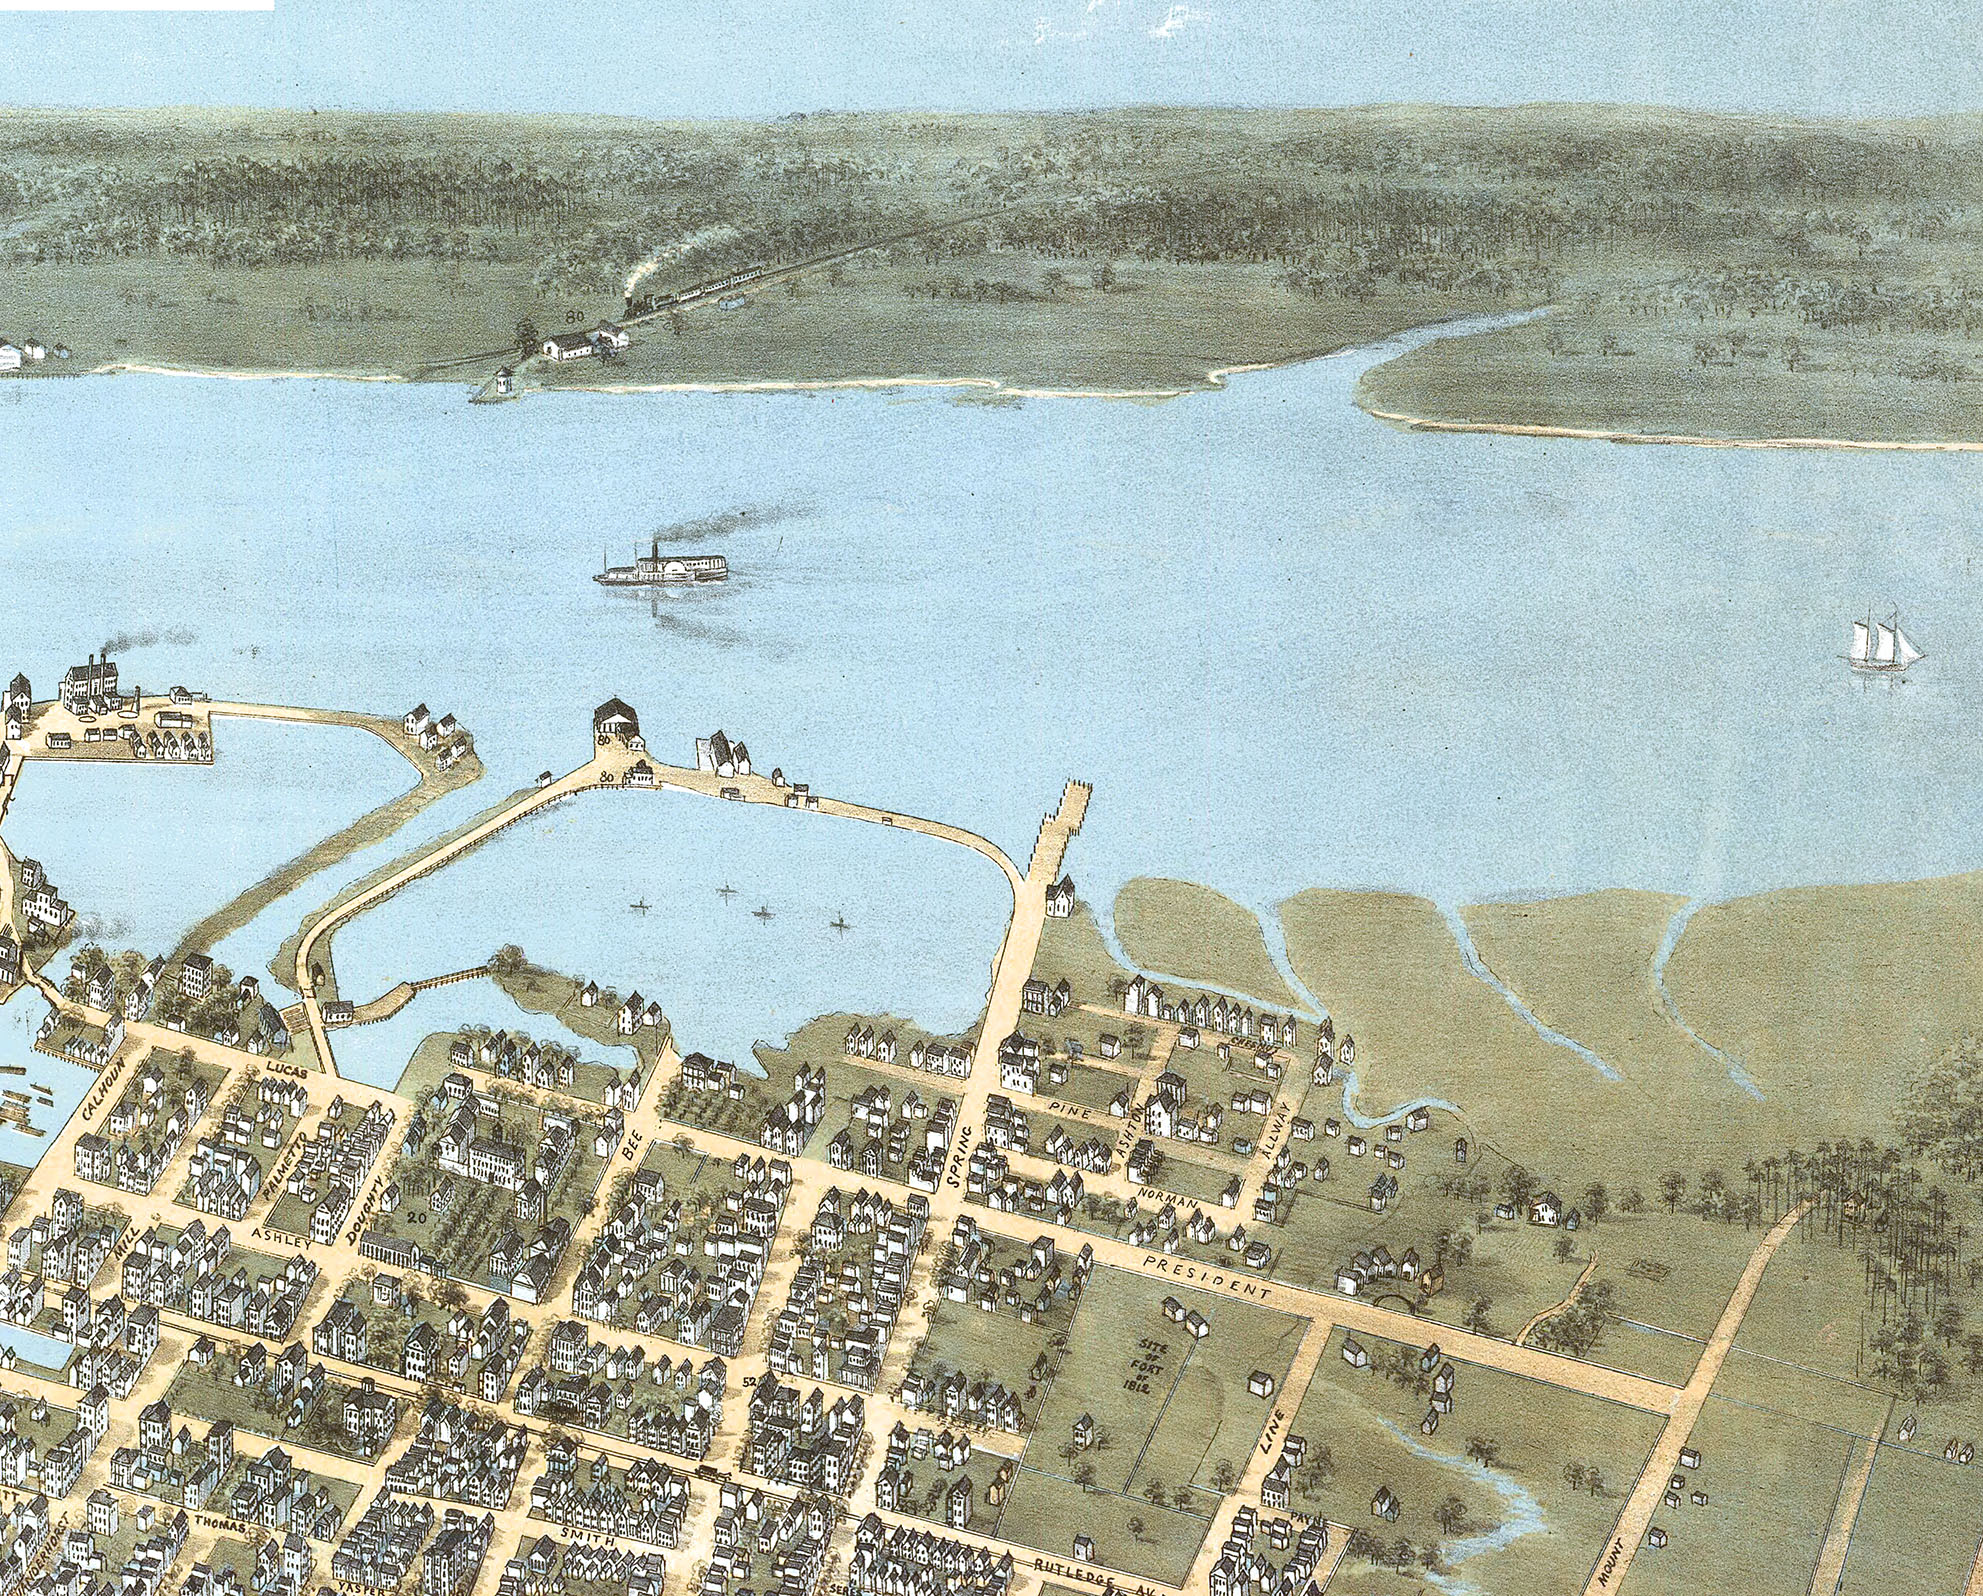 20x30 1872 Charleston South Carolina Vintage Old Panoramic City Map